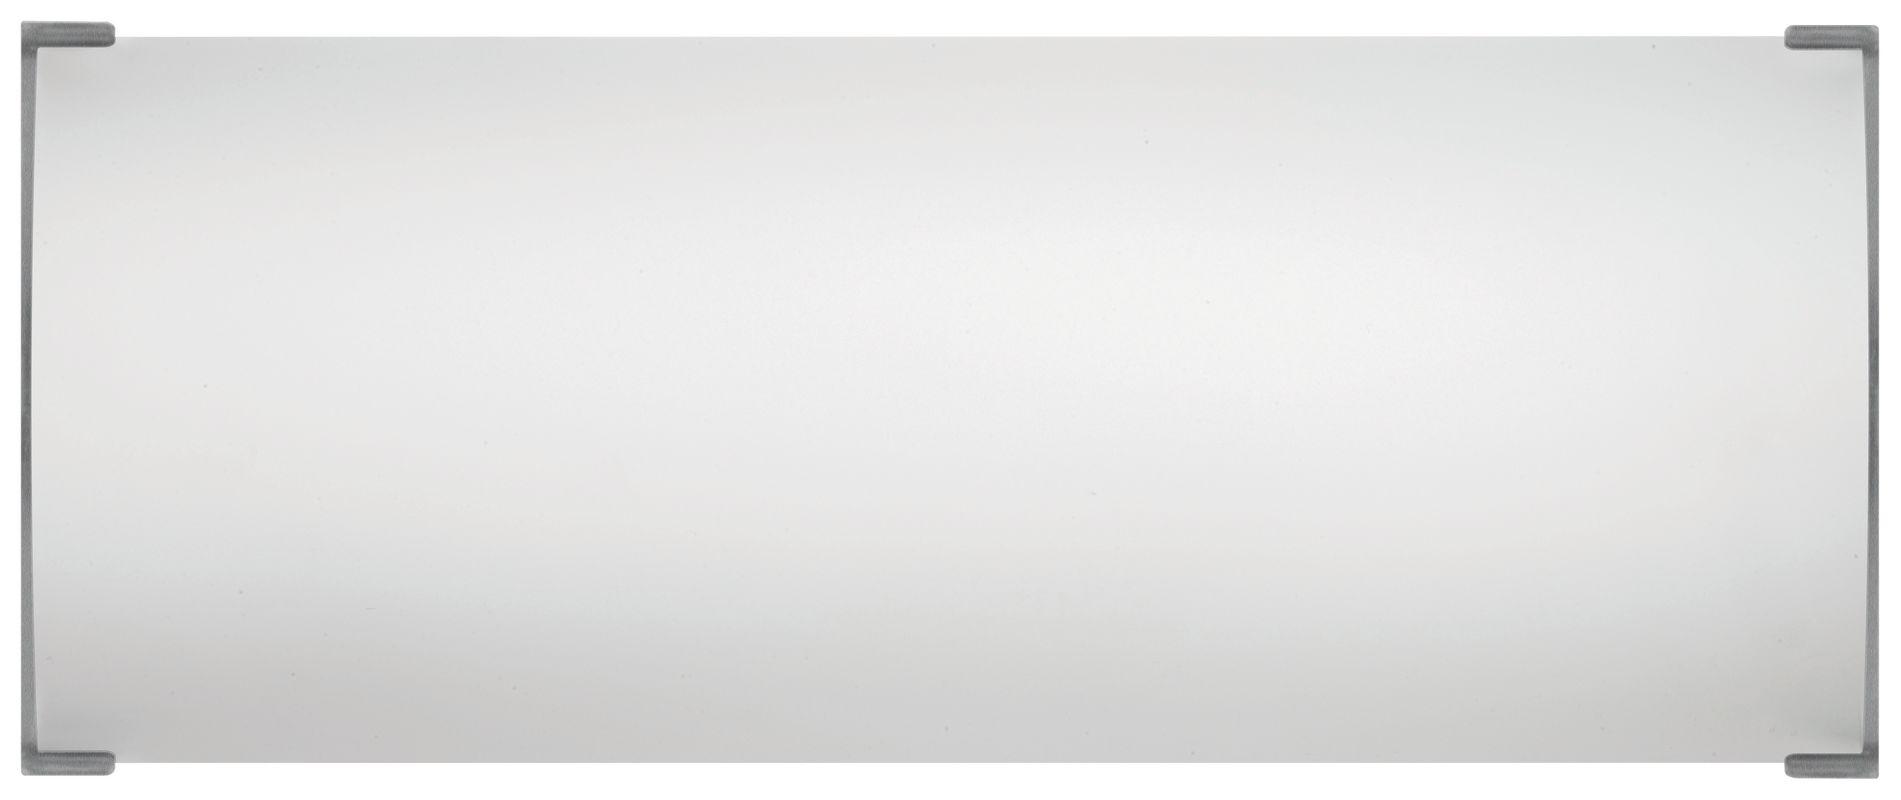 Philips FL0009836 Edge LED 1 Light Wall Sconce Satin Nickel Indoor